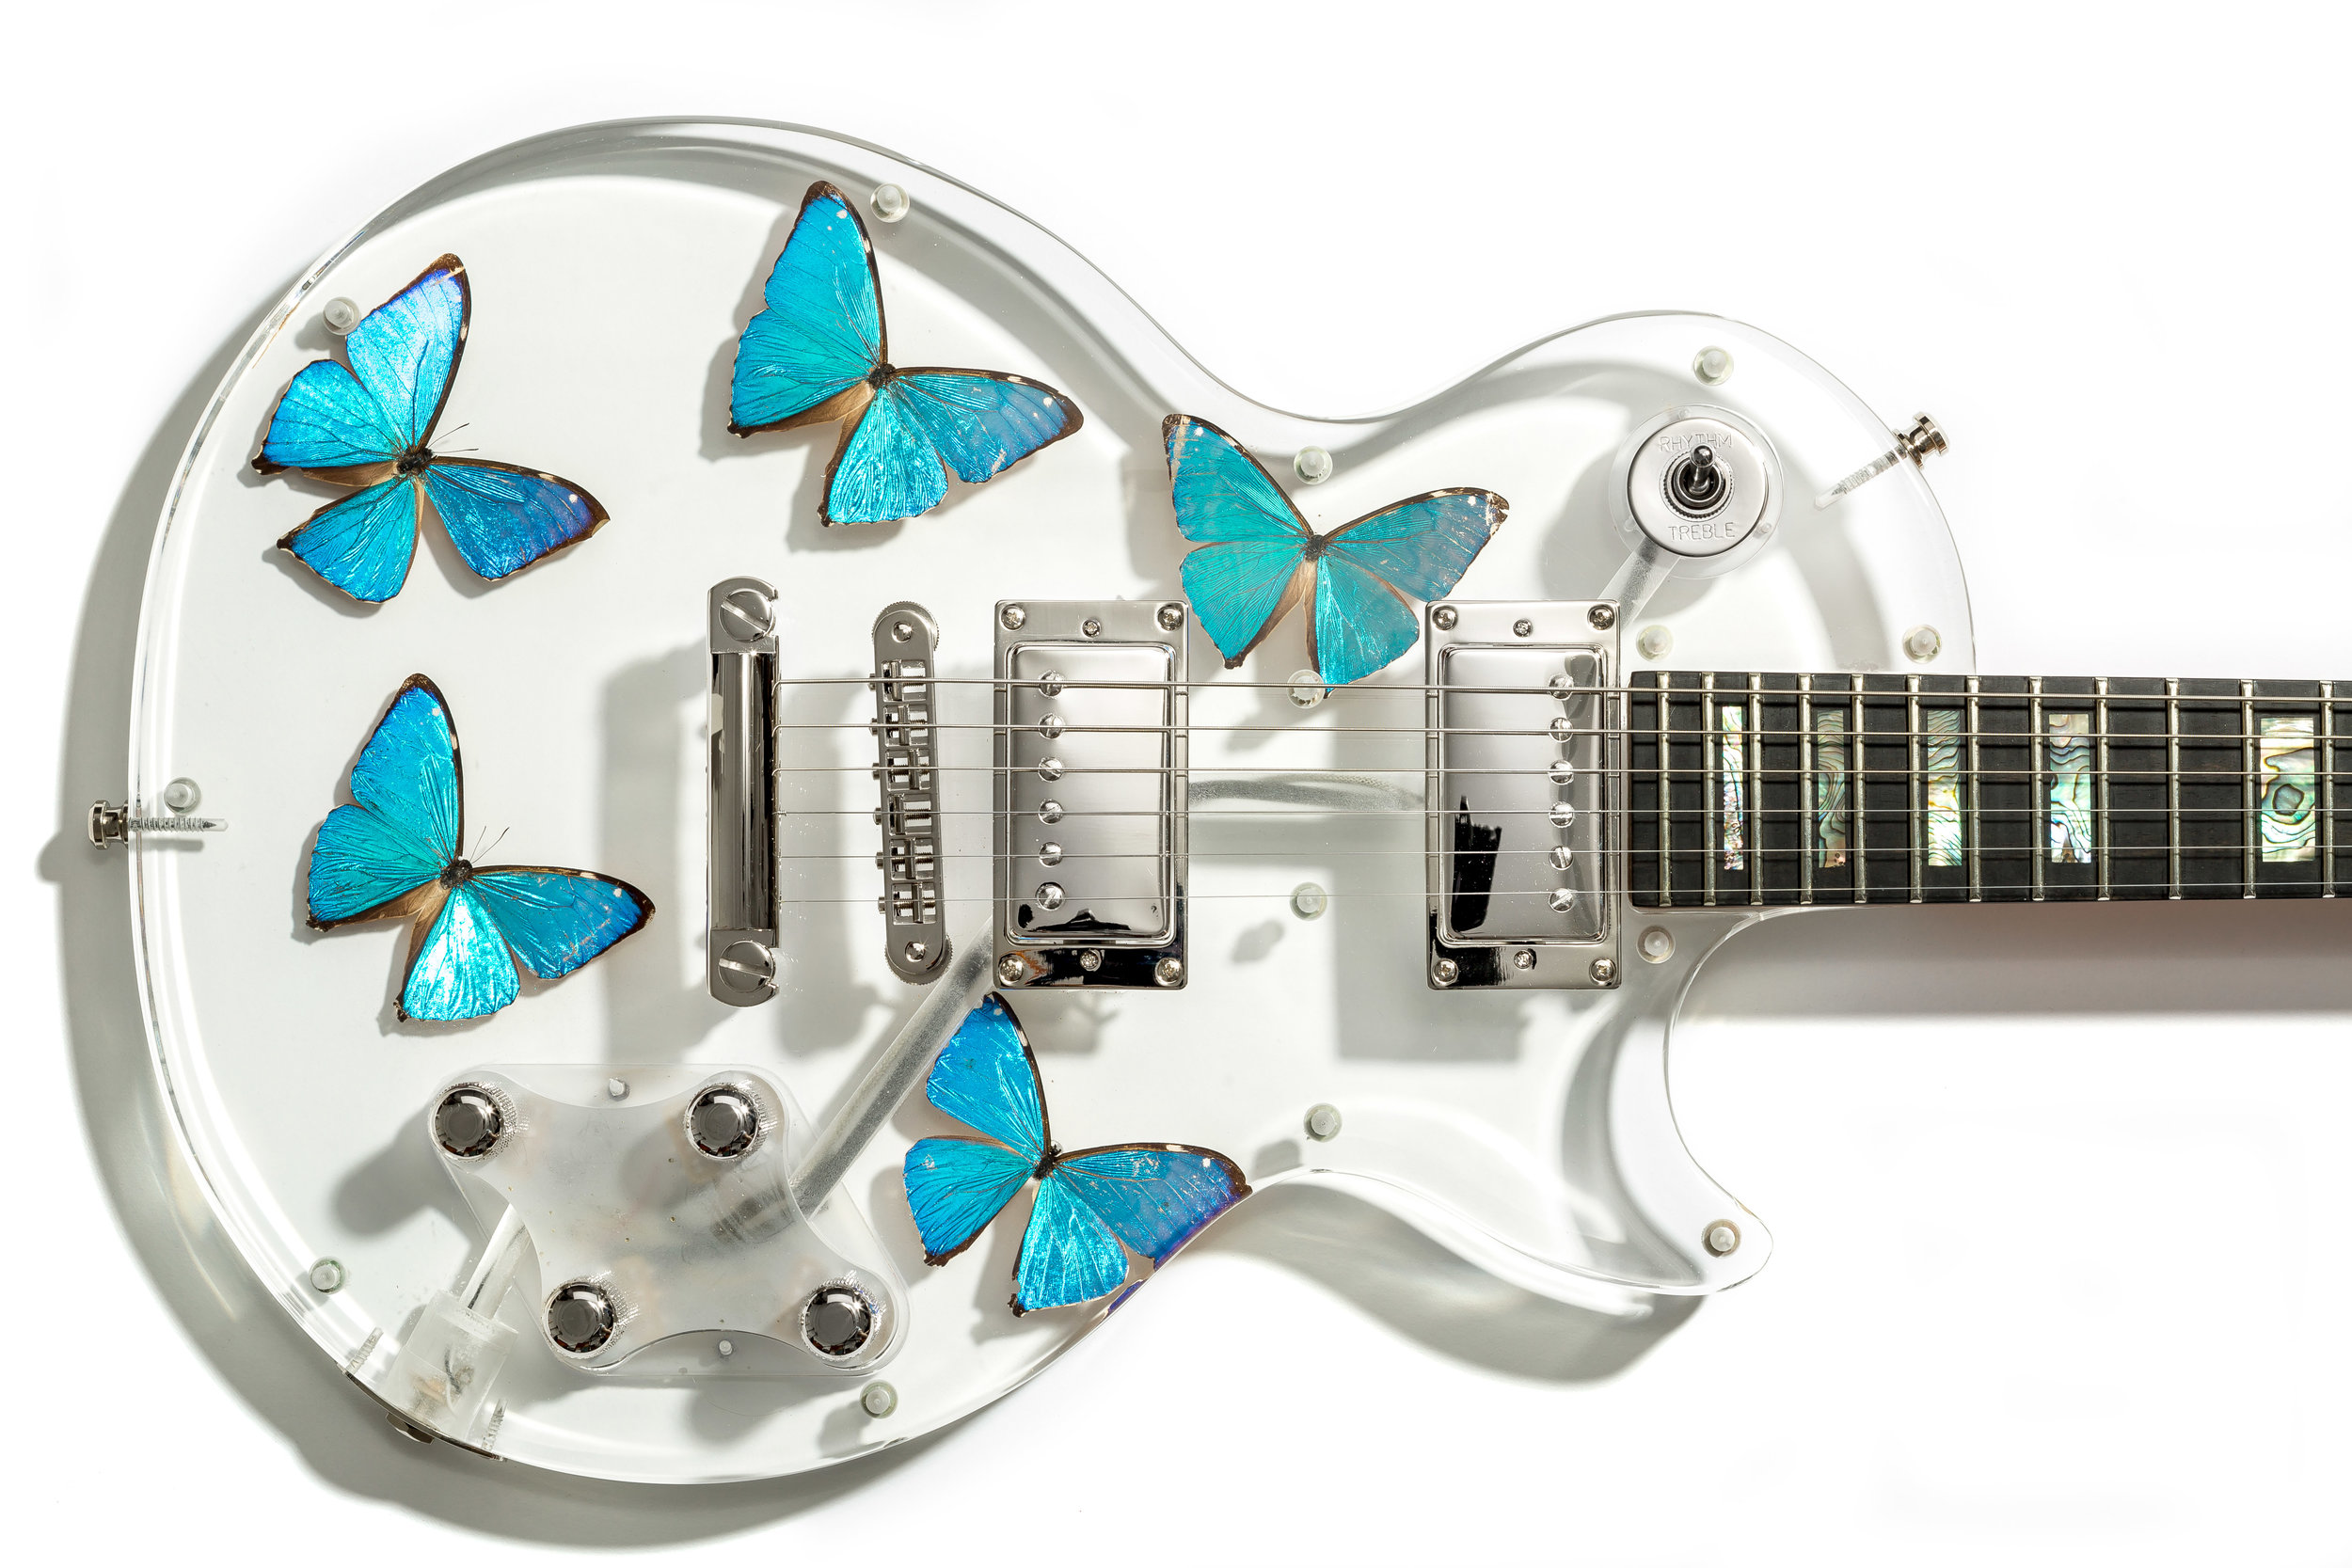 James-Lamerton-Butterfly-019.jpg